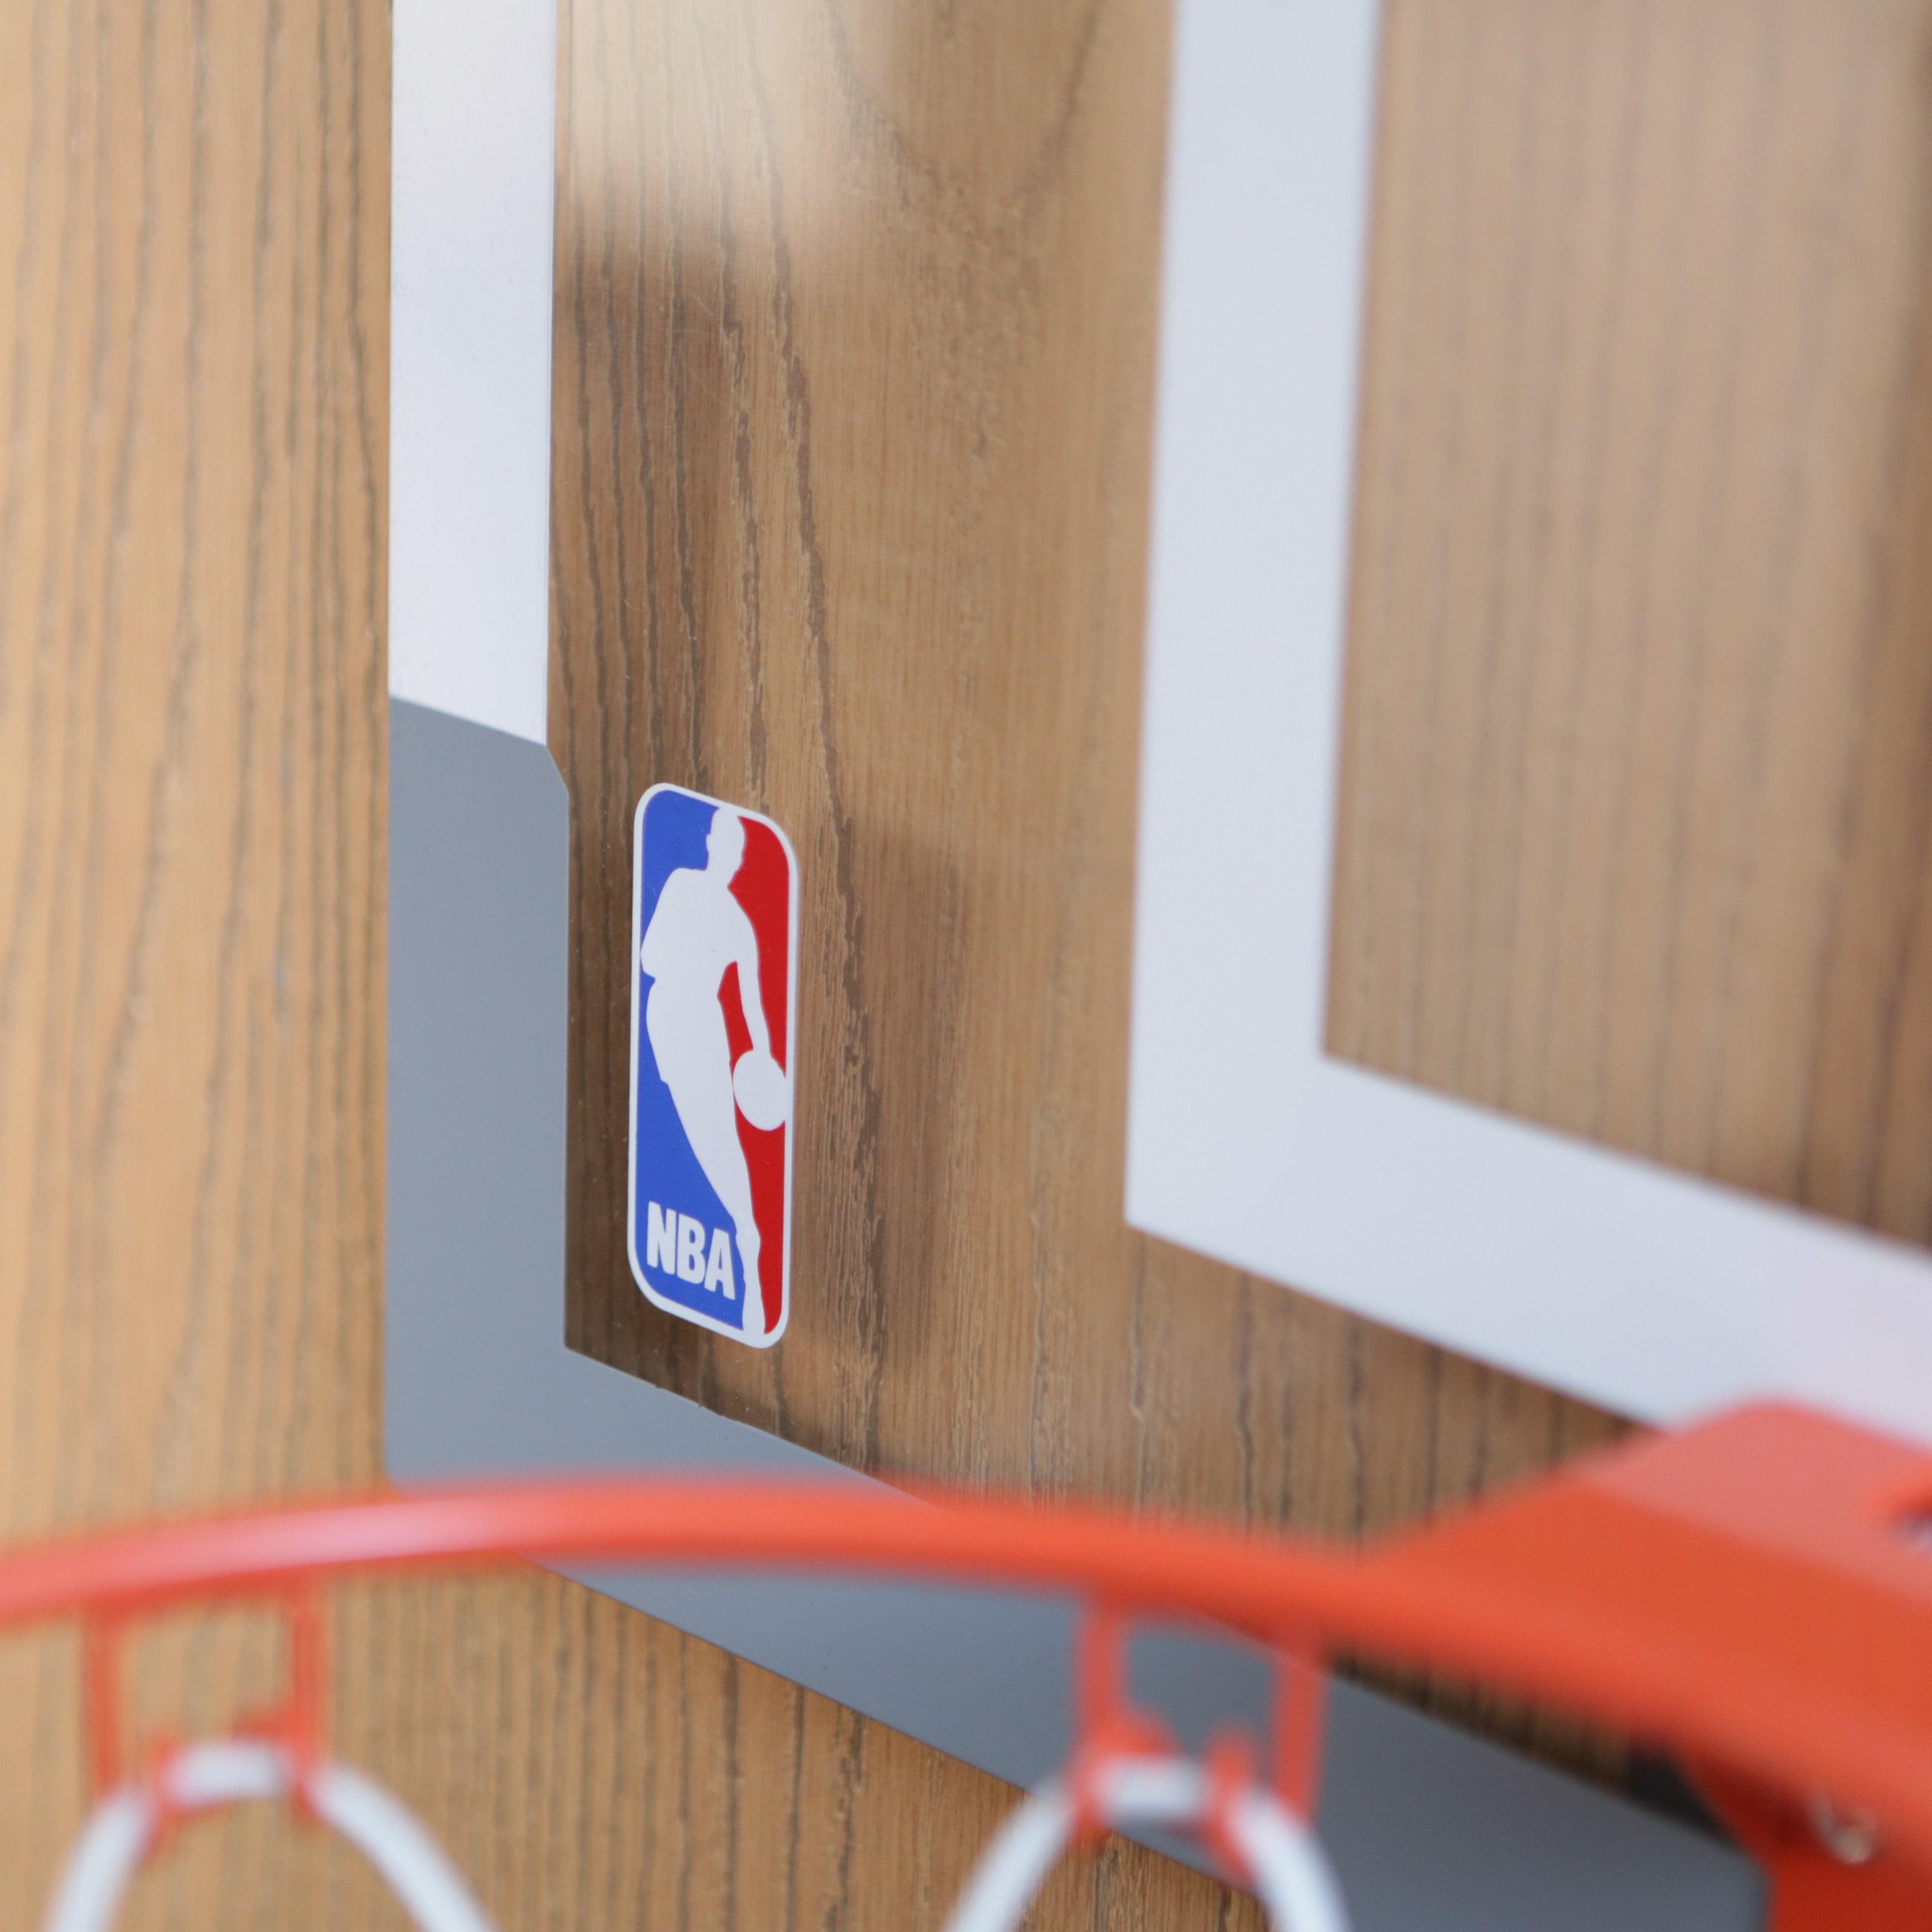 Spalding NBA Slam Jam Over-The-Door Mini Hoop with Mini Basketball - Walmart.com & Spalding NBA Slam Jam Over-The-Door Mini Hoop with Mini Basketball ... Pezcame.Com